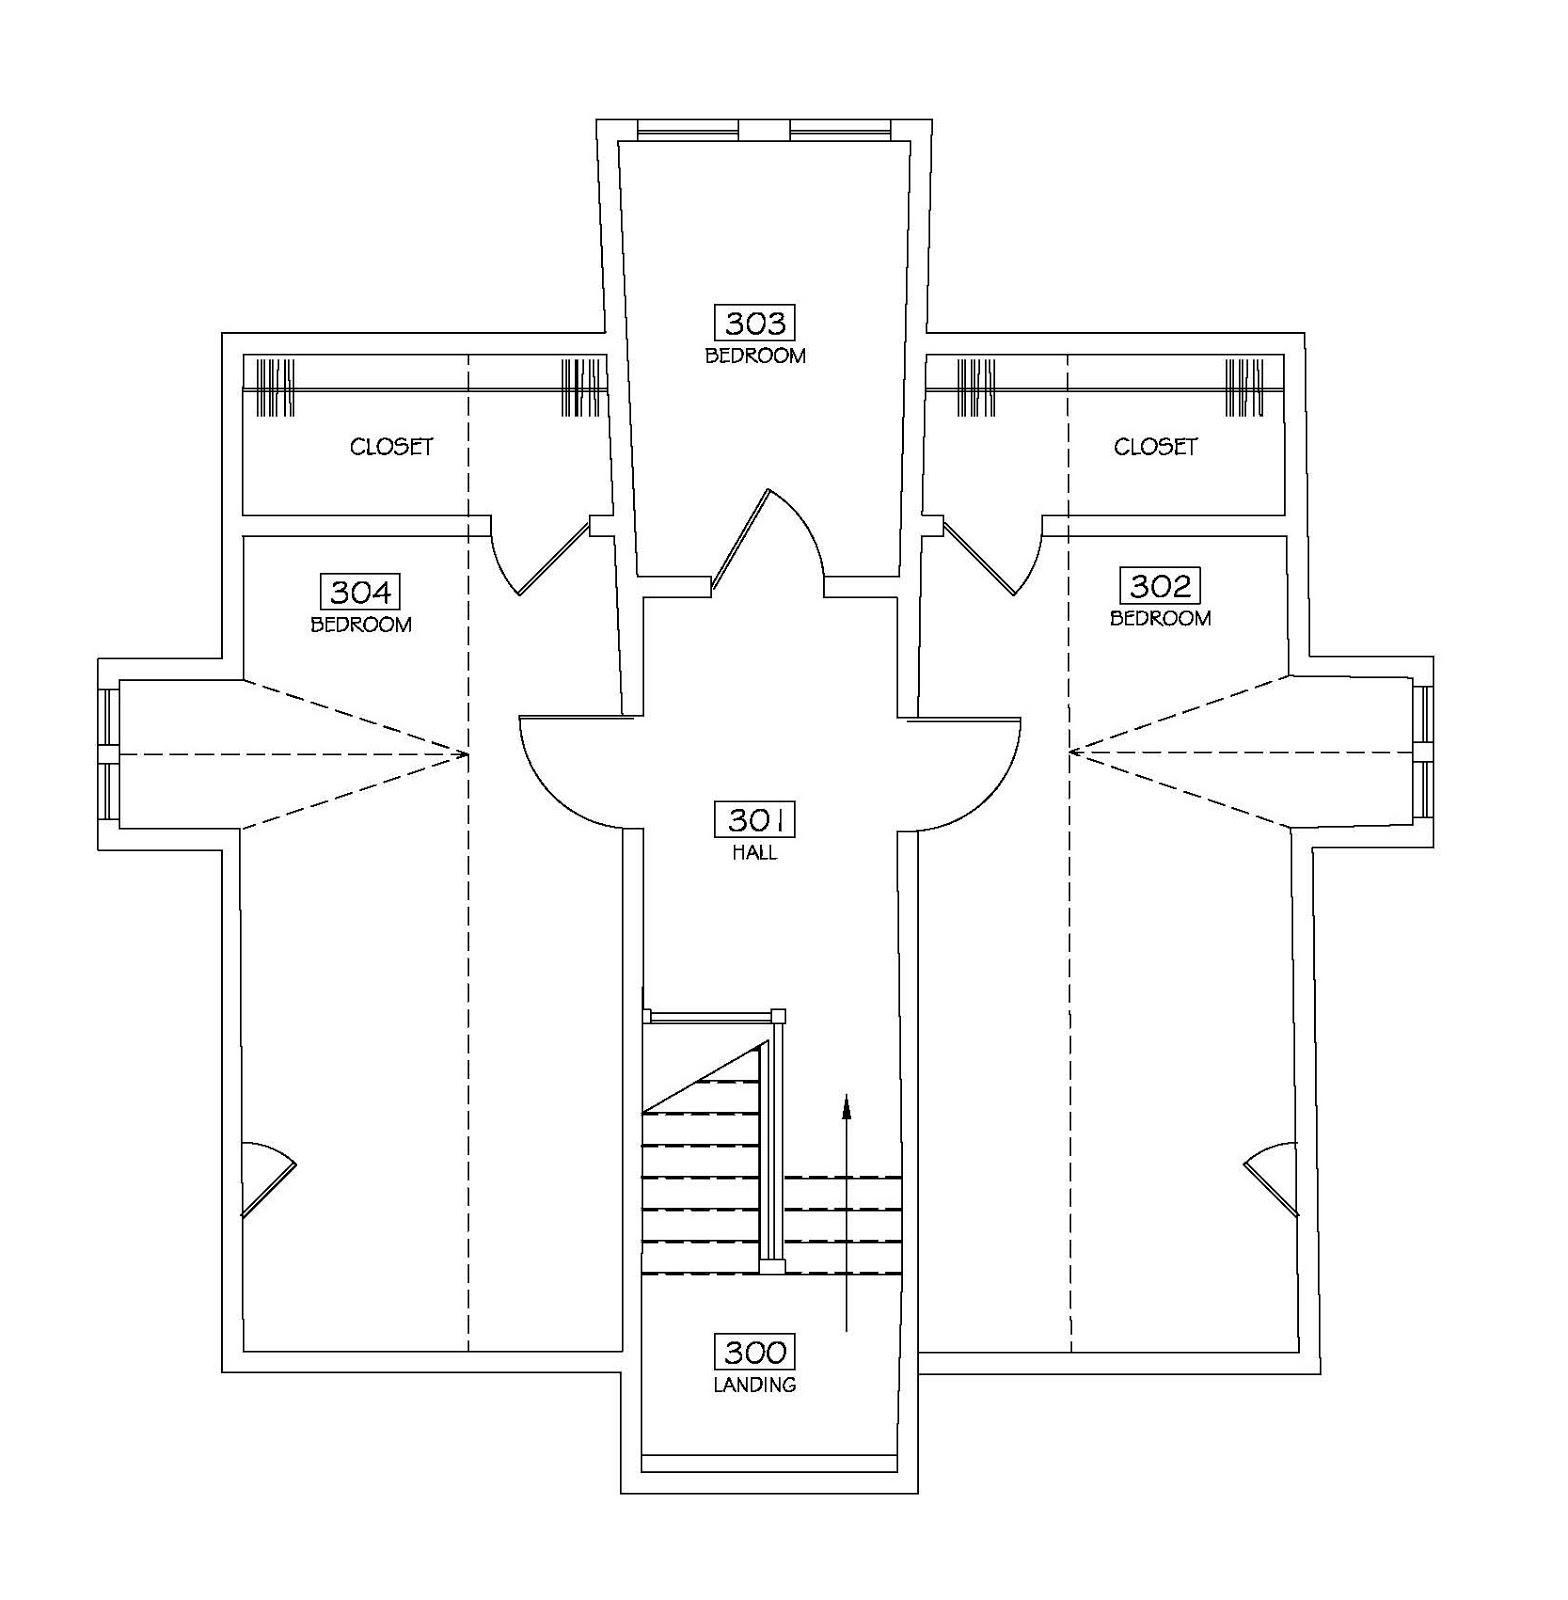 curtis pdf plans home depot floor plan home depot floor plan designer idea home and house